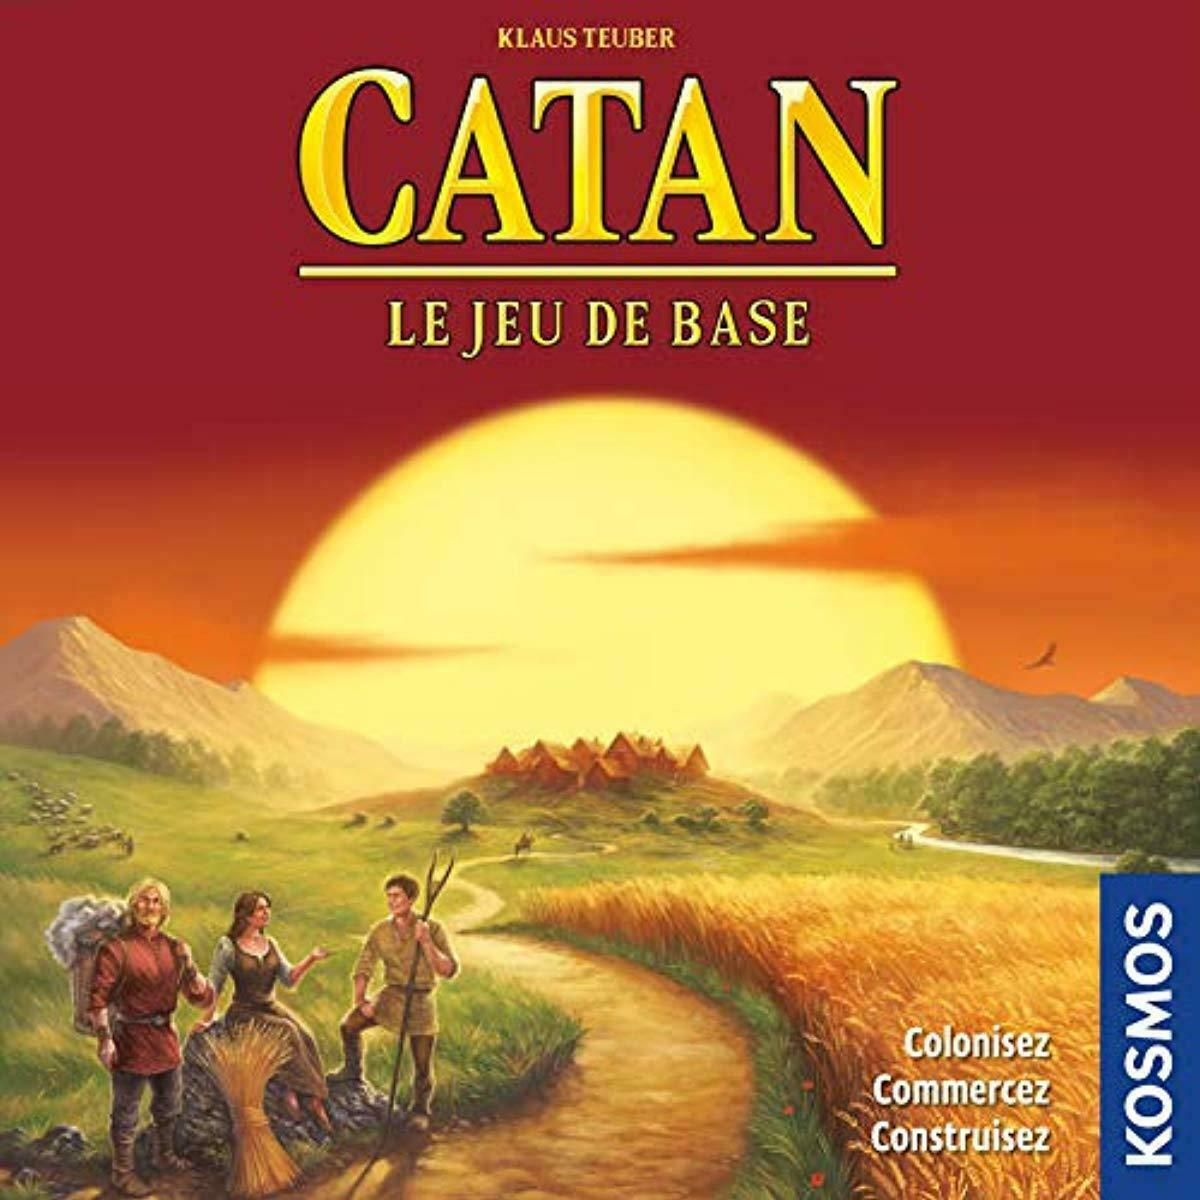 Jeu de Strat/égie Asmodee Le Jeu de Base 3//4 joueurs Catan